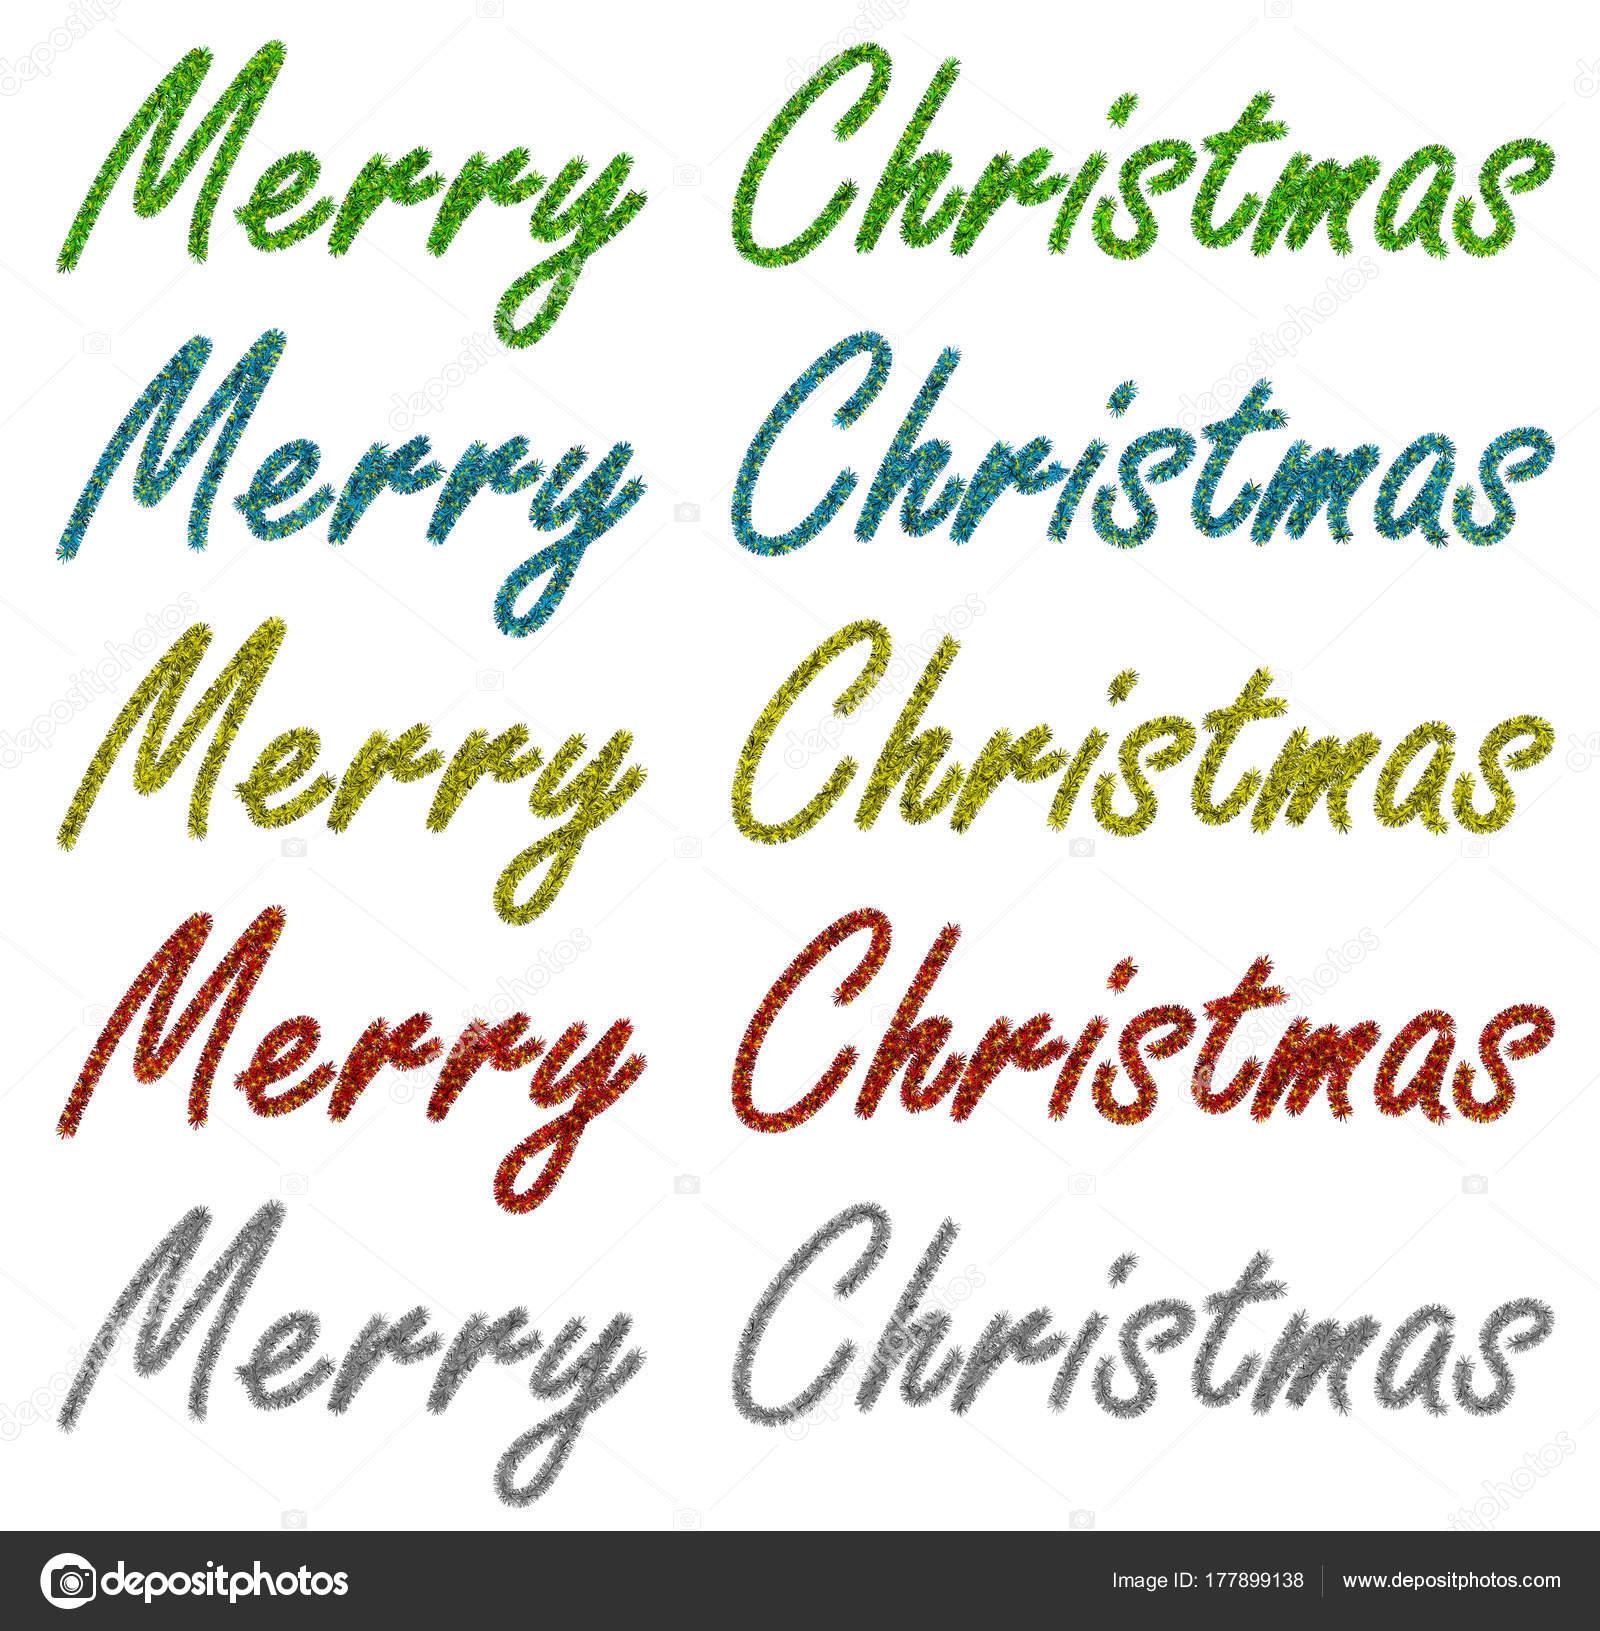 Girlande aus Lametta - Frohe Weihnachten — Stockfoto © venakr #177899138